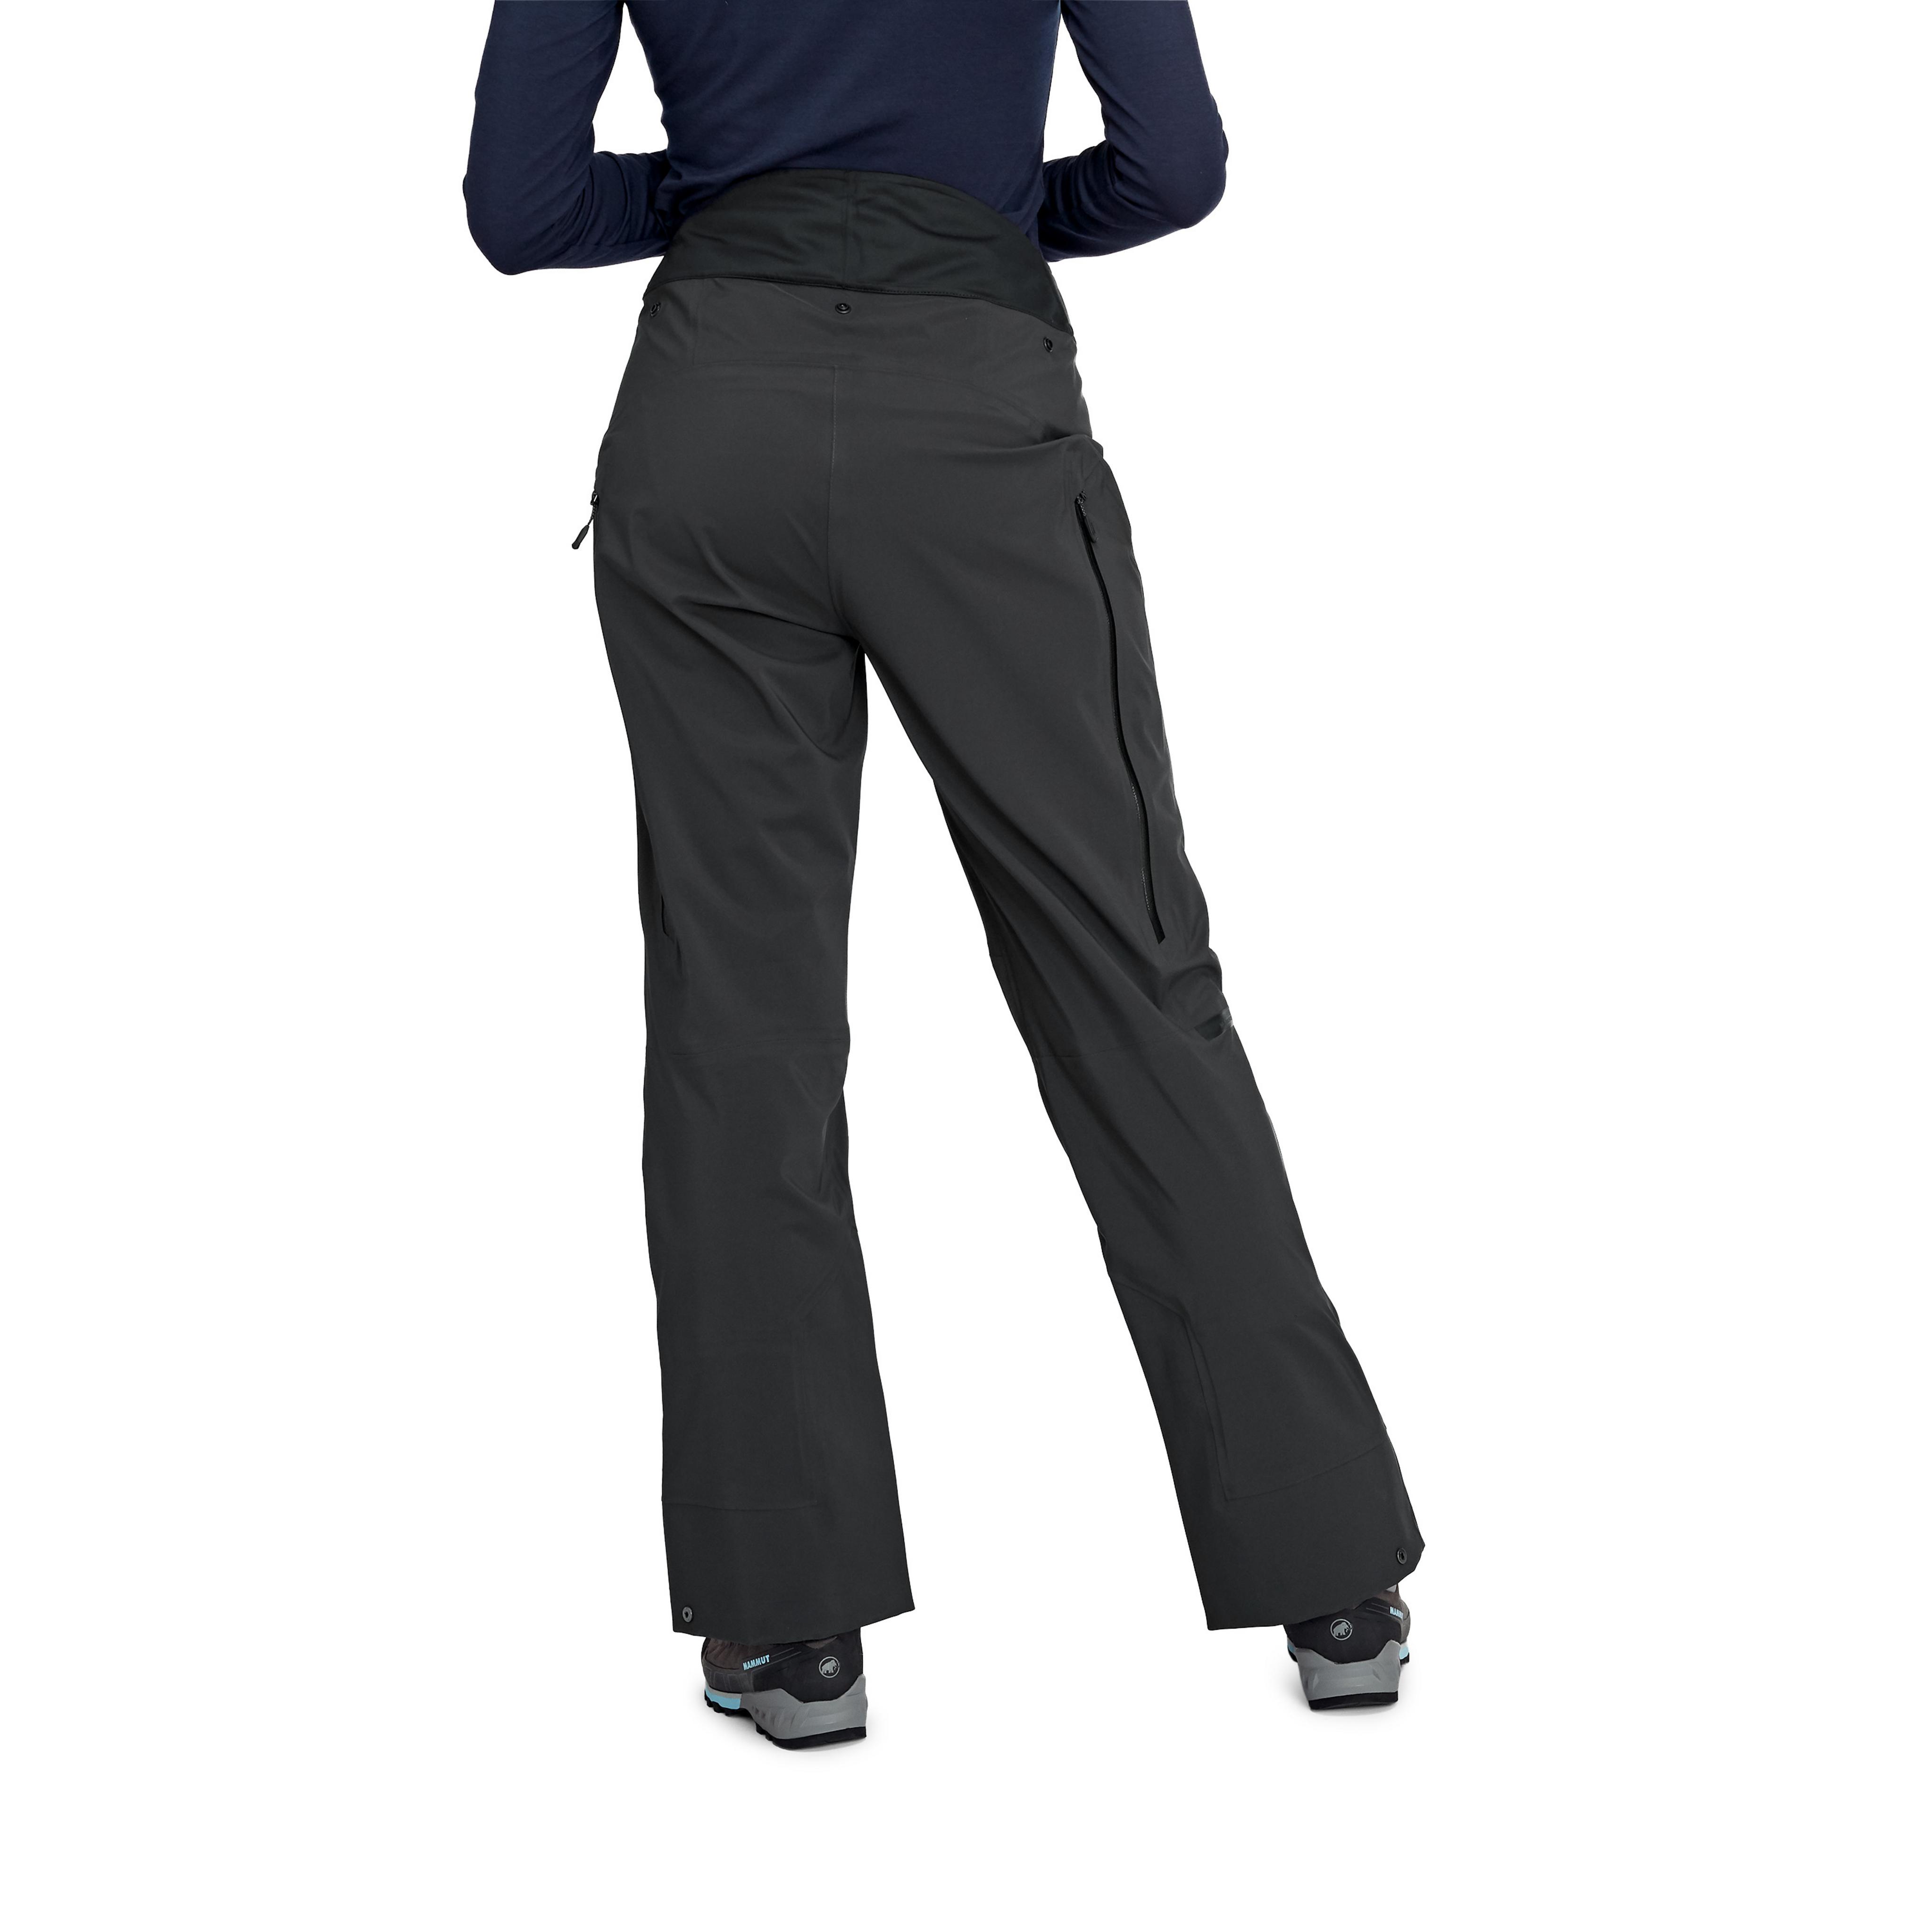 Haldigrat HS Pants Women product image